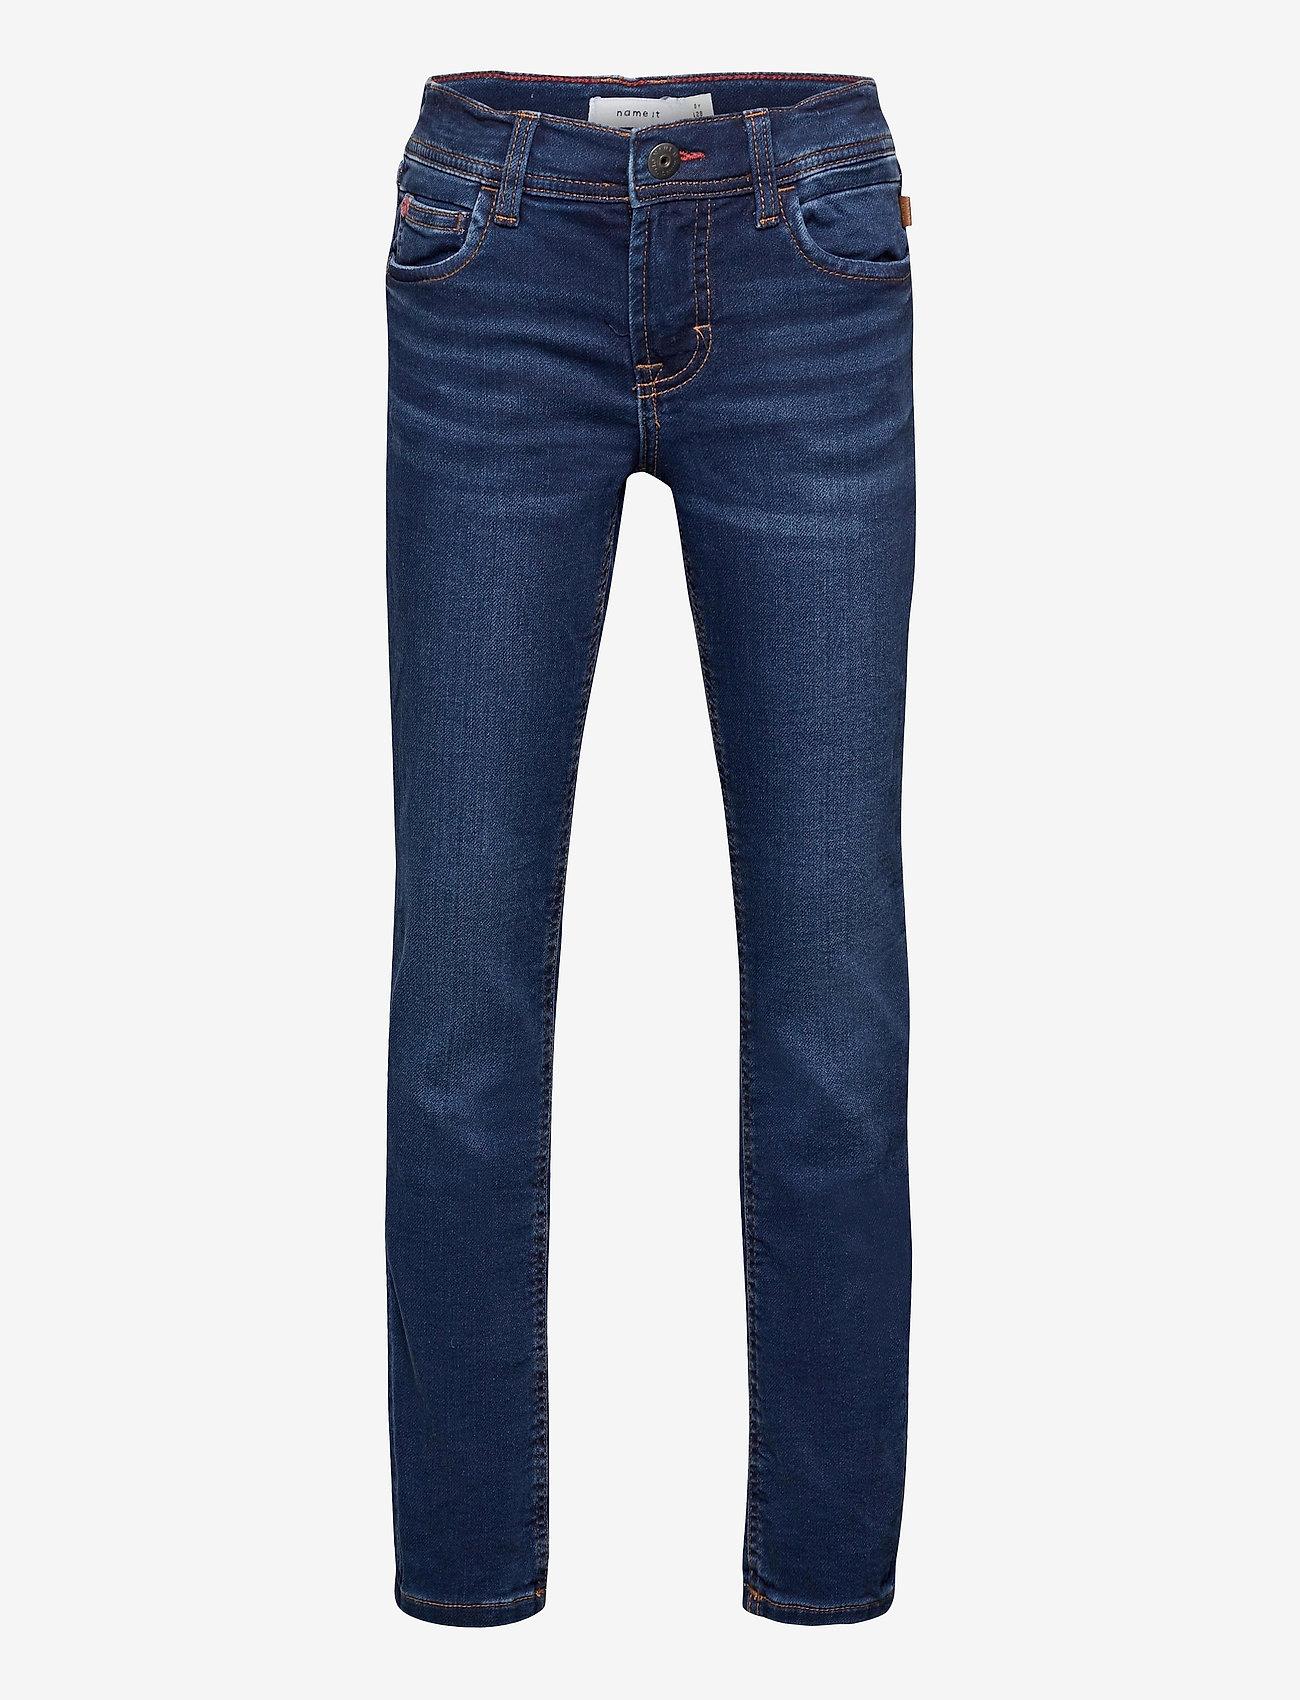 name it - NKMTHEO DNMTIMES 3470 SWE PANT NOOS - jeans - dark blue denim - 0